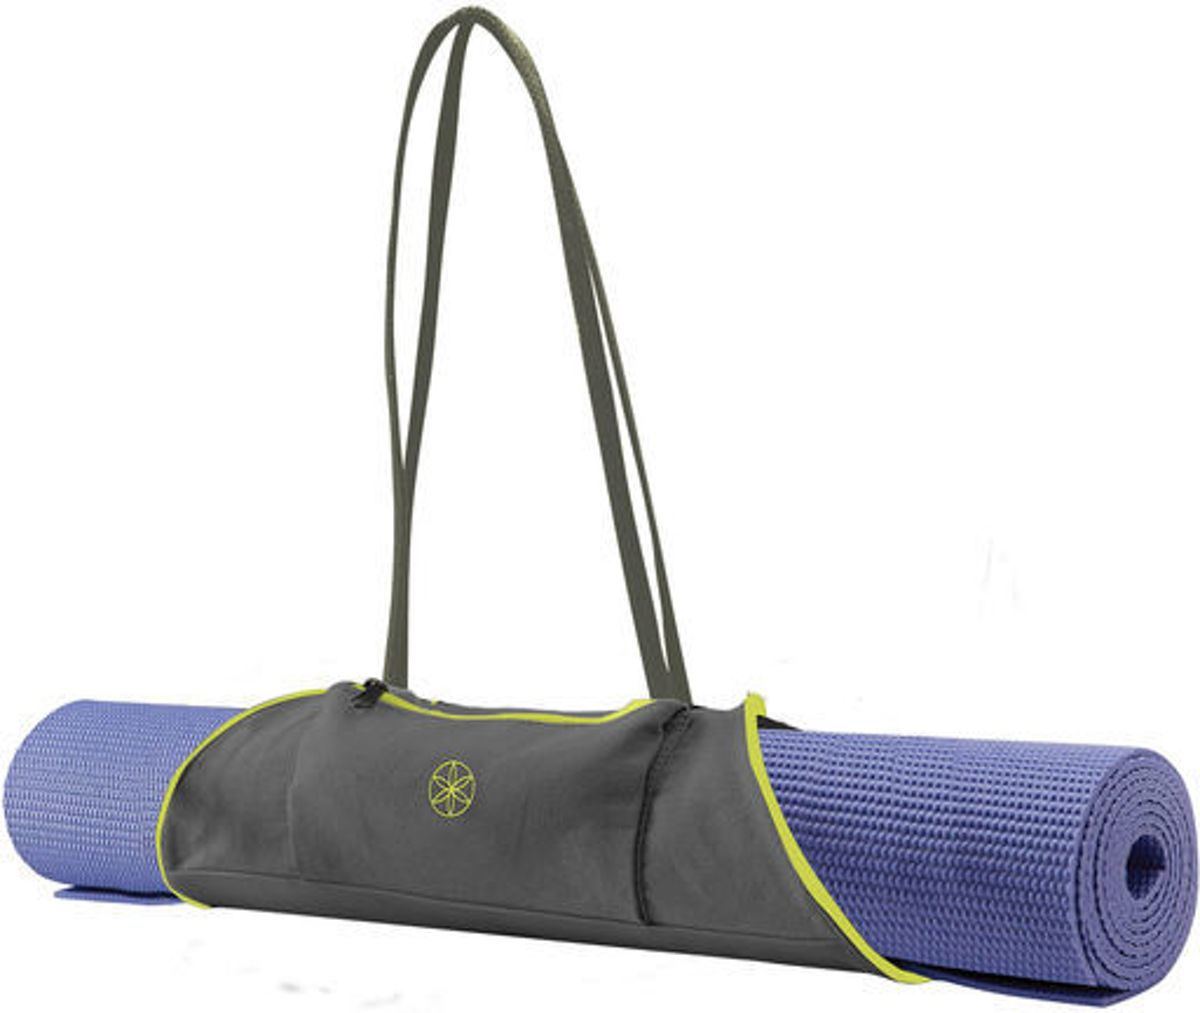 Gaiam Yoga Mat Draagtas - Citron / Storm